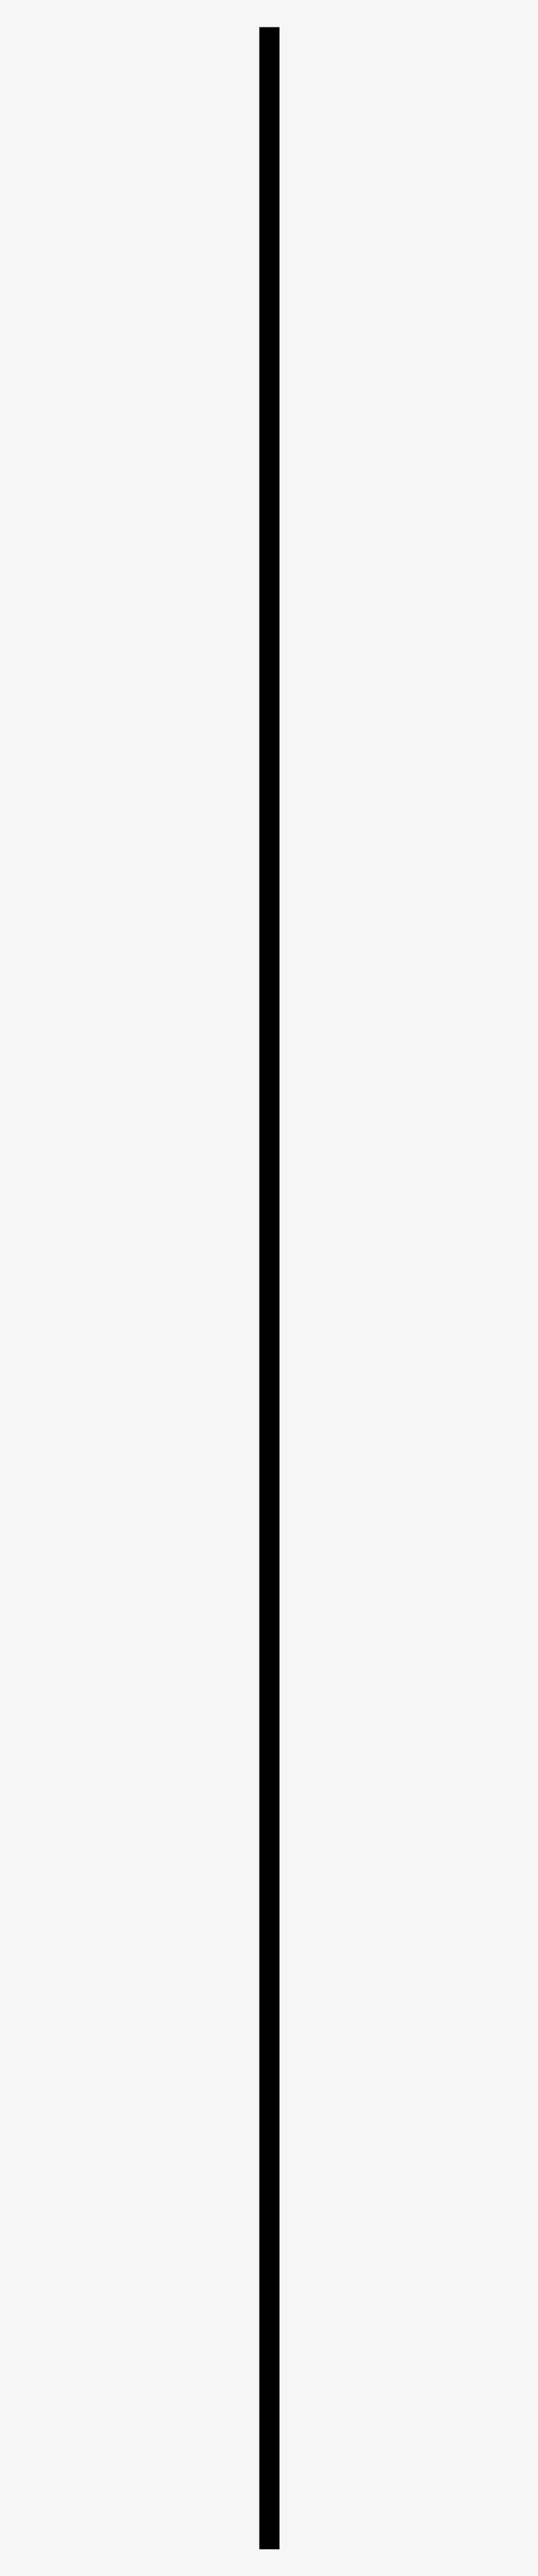 Straight Vertical Line Png - Xiaomi Redmi 5 Plus, transparent png #4342565